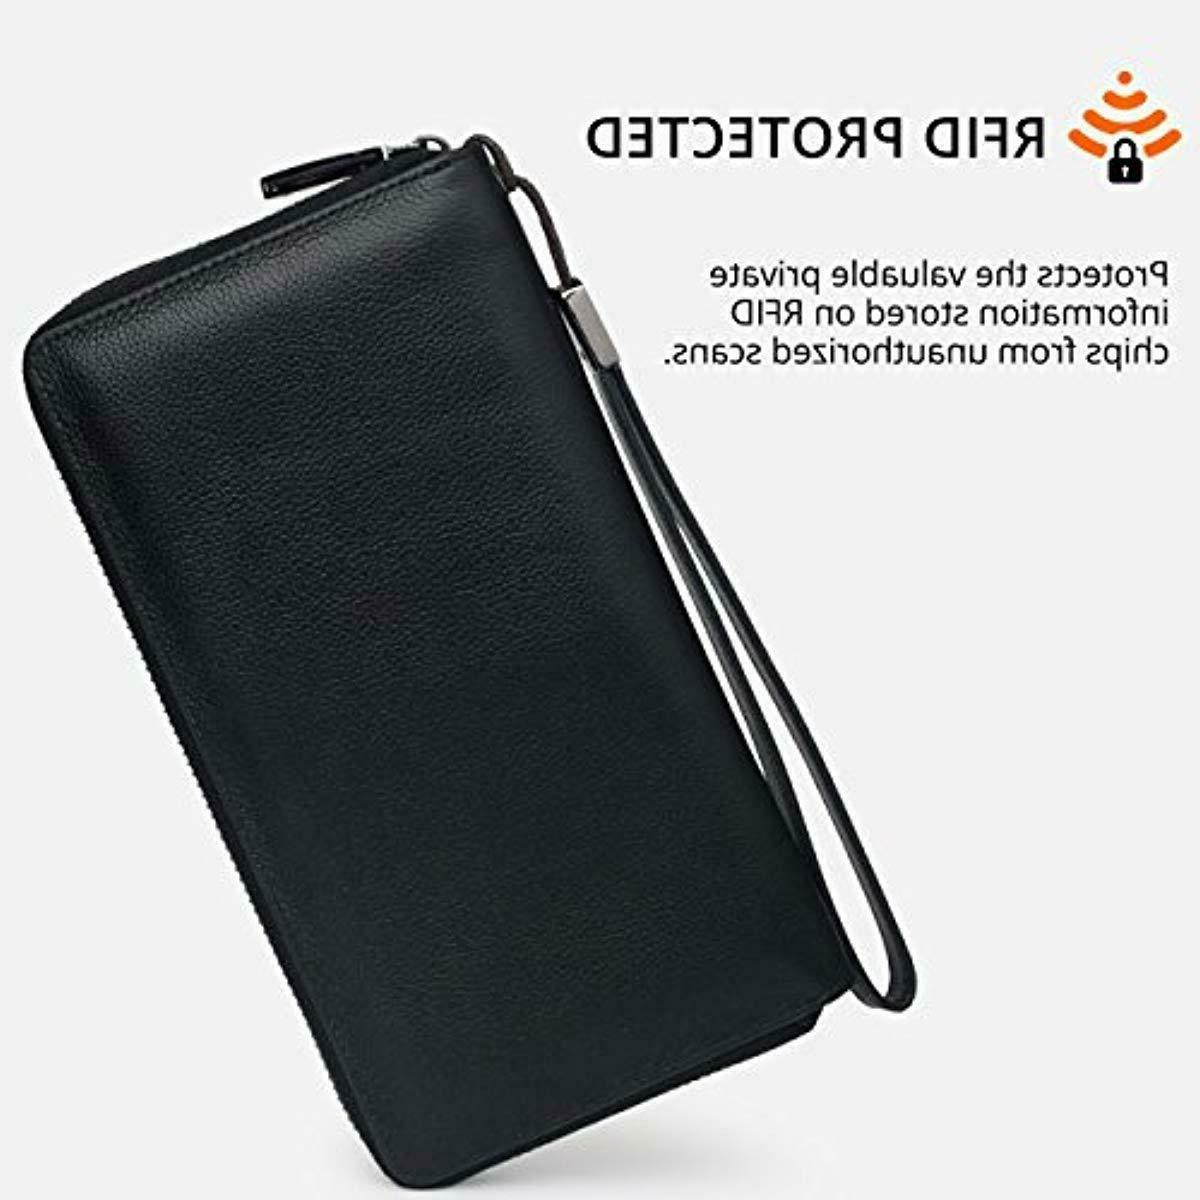 Bveyzi RFID Blocking Wallet Leather Zip Phone Clutch Purse Black